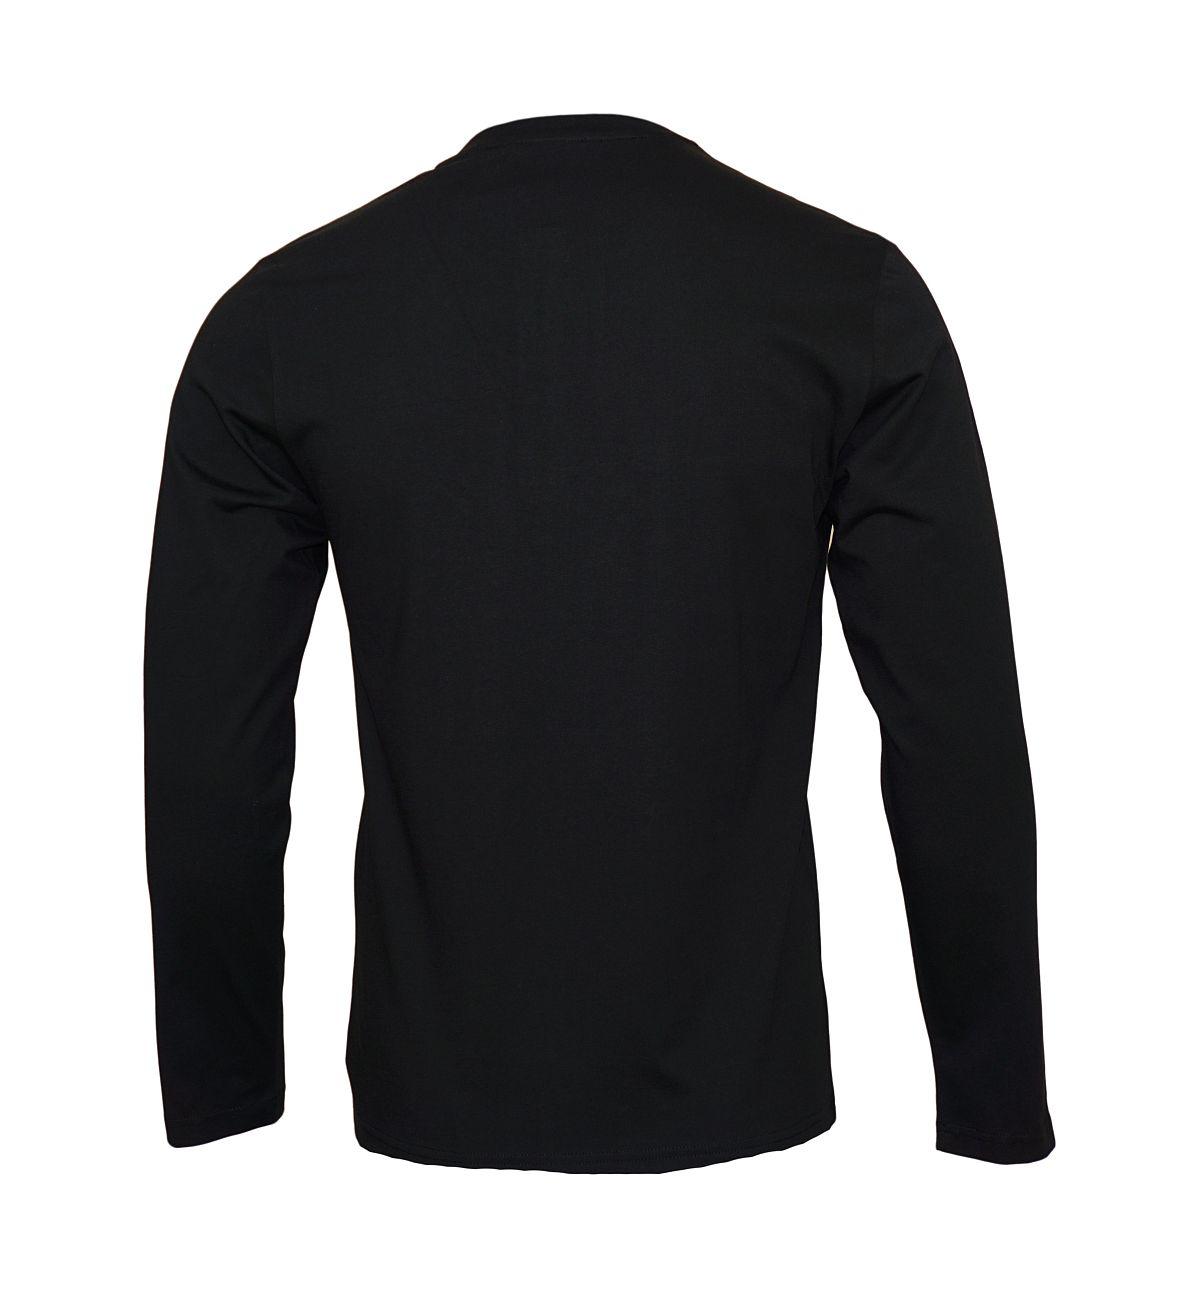 Emporio Armani Longsleeve Henley Sweater 111817 8A576 00020 NERO WX18-EAL